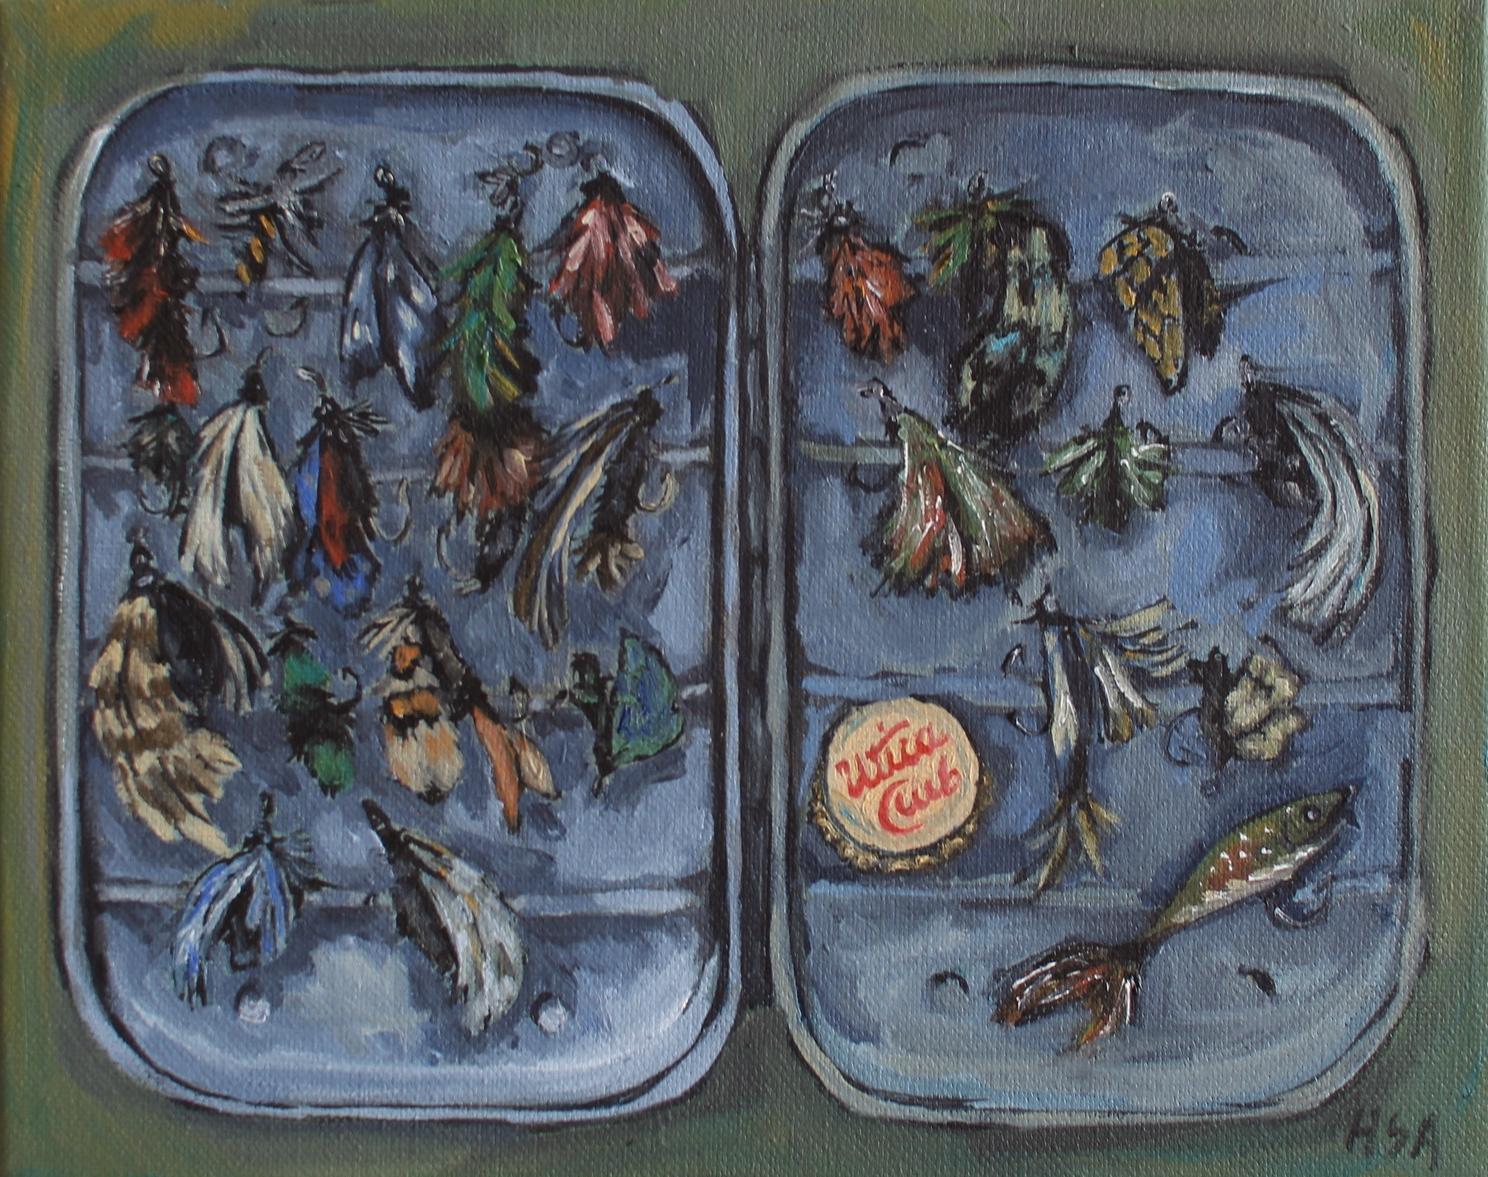 Fisherman's Wallet